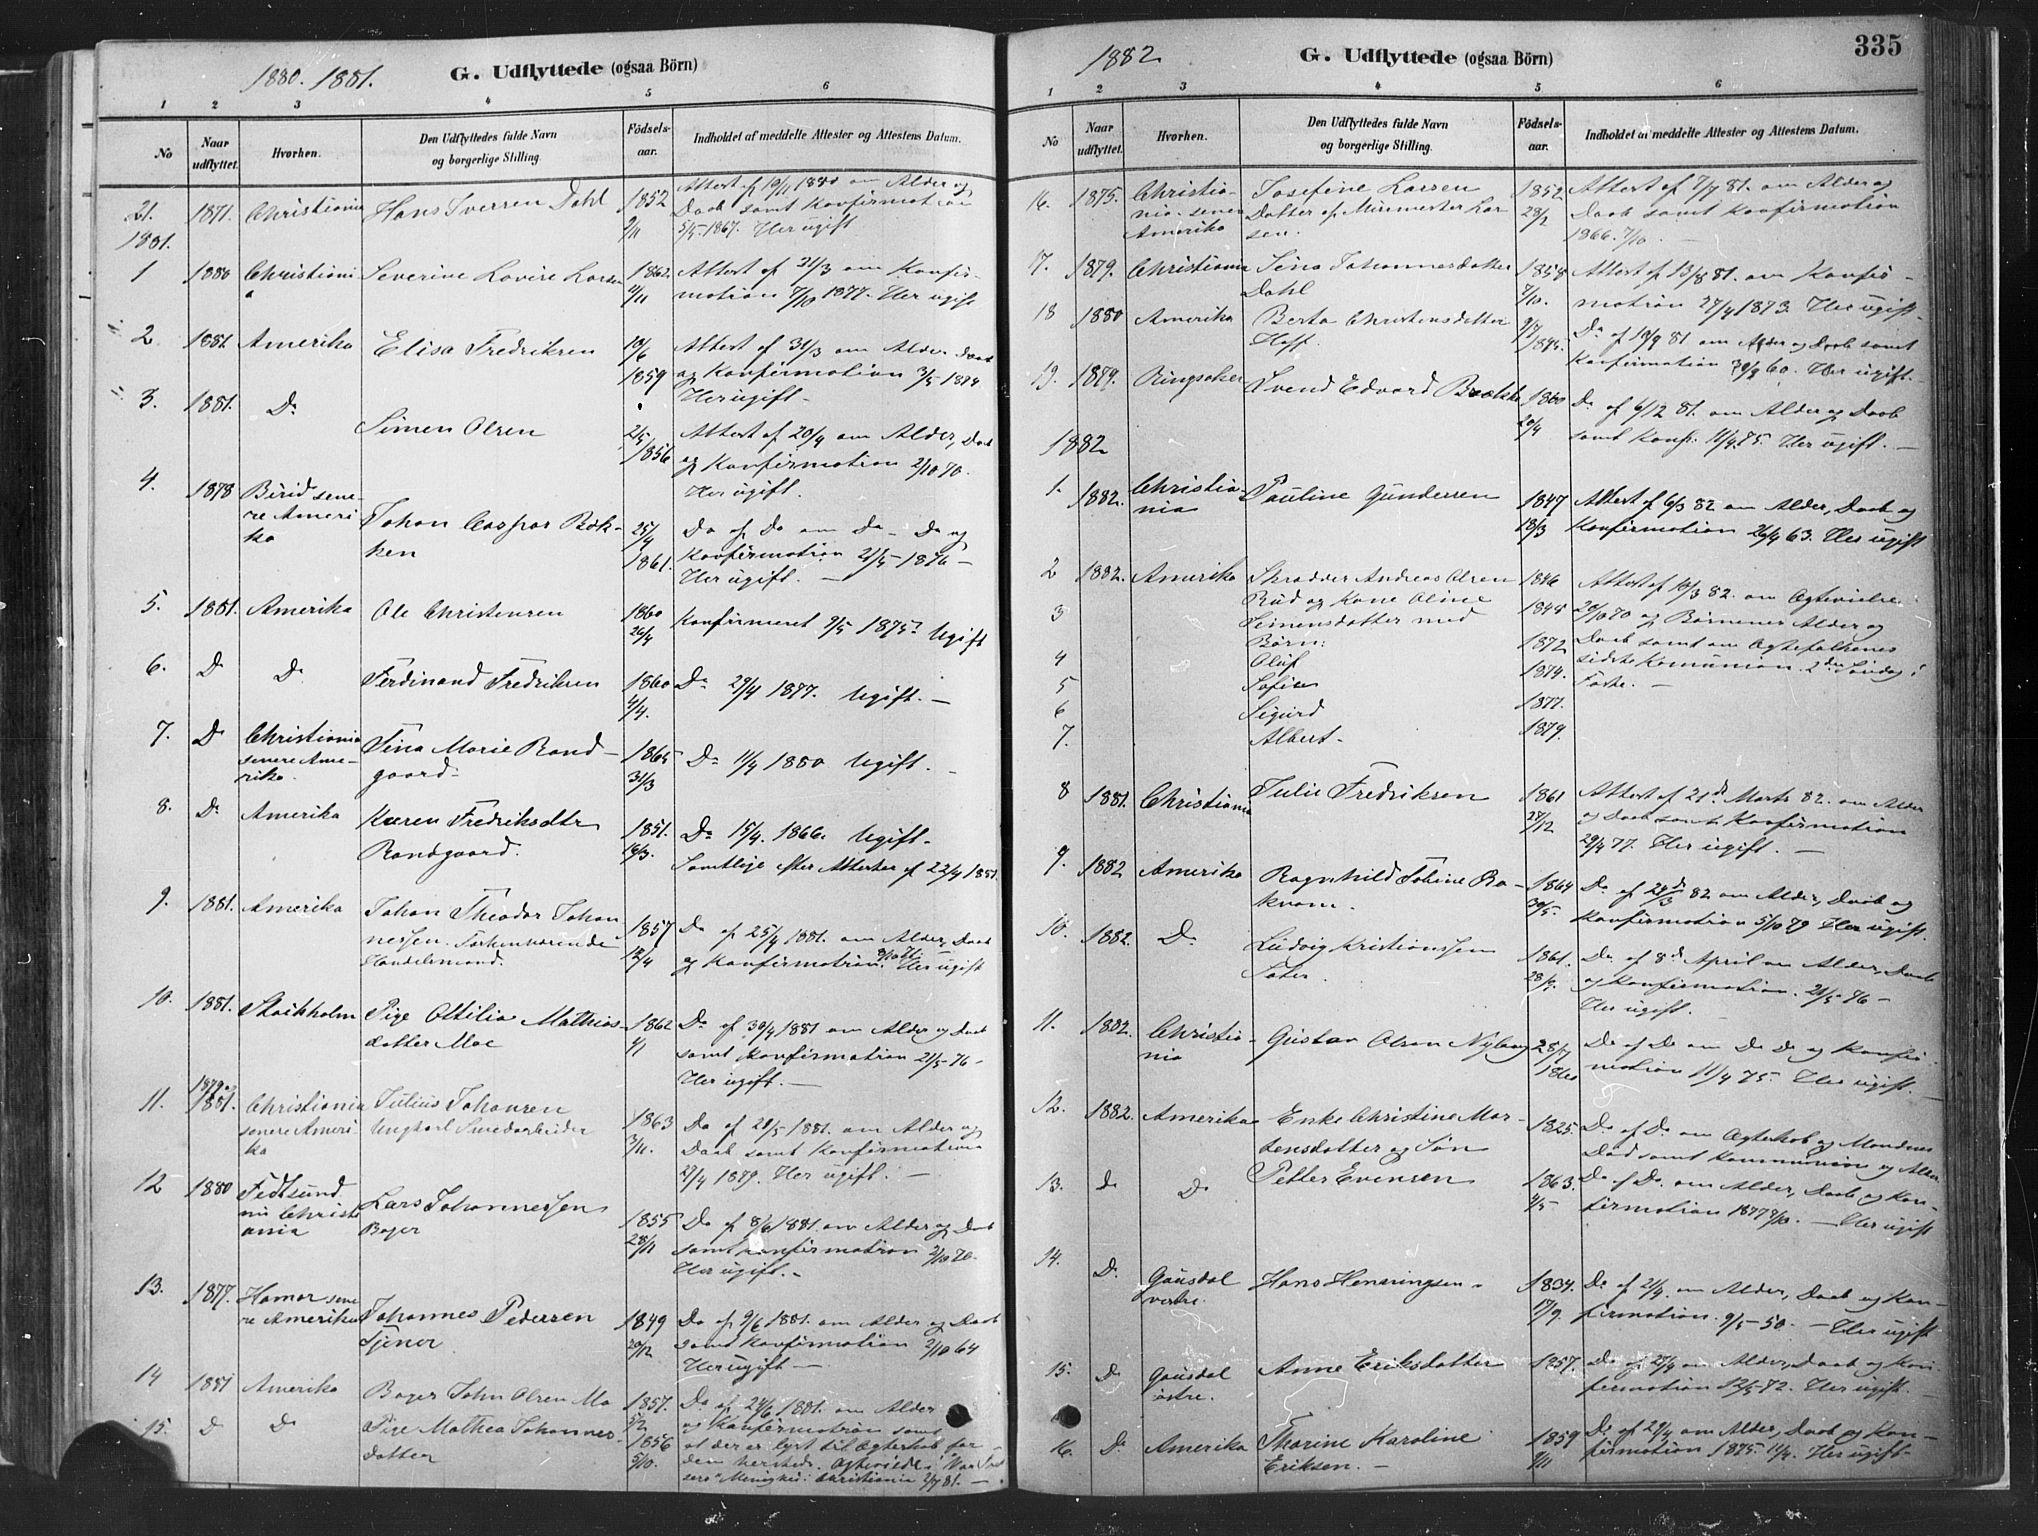 SAH, Fåberg prestekontor, Ministerialbok nr. 10, 1879-1900, s. 335